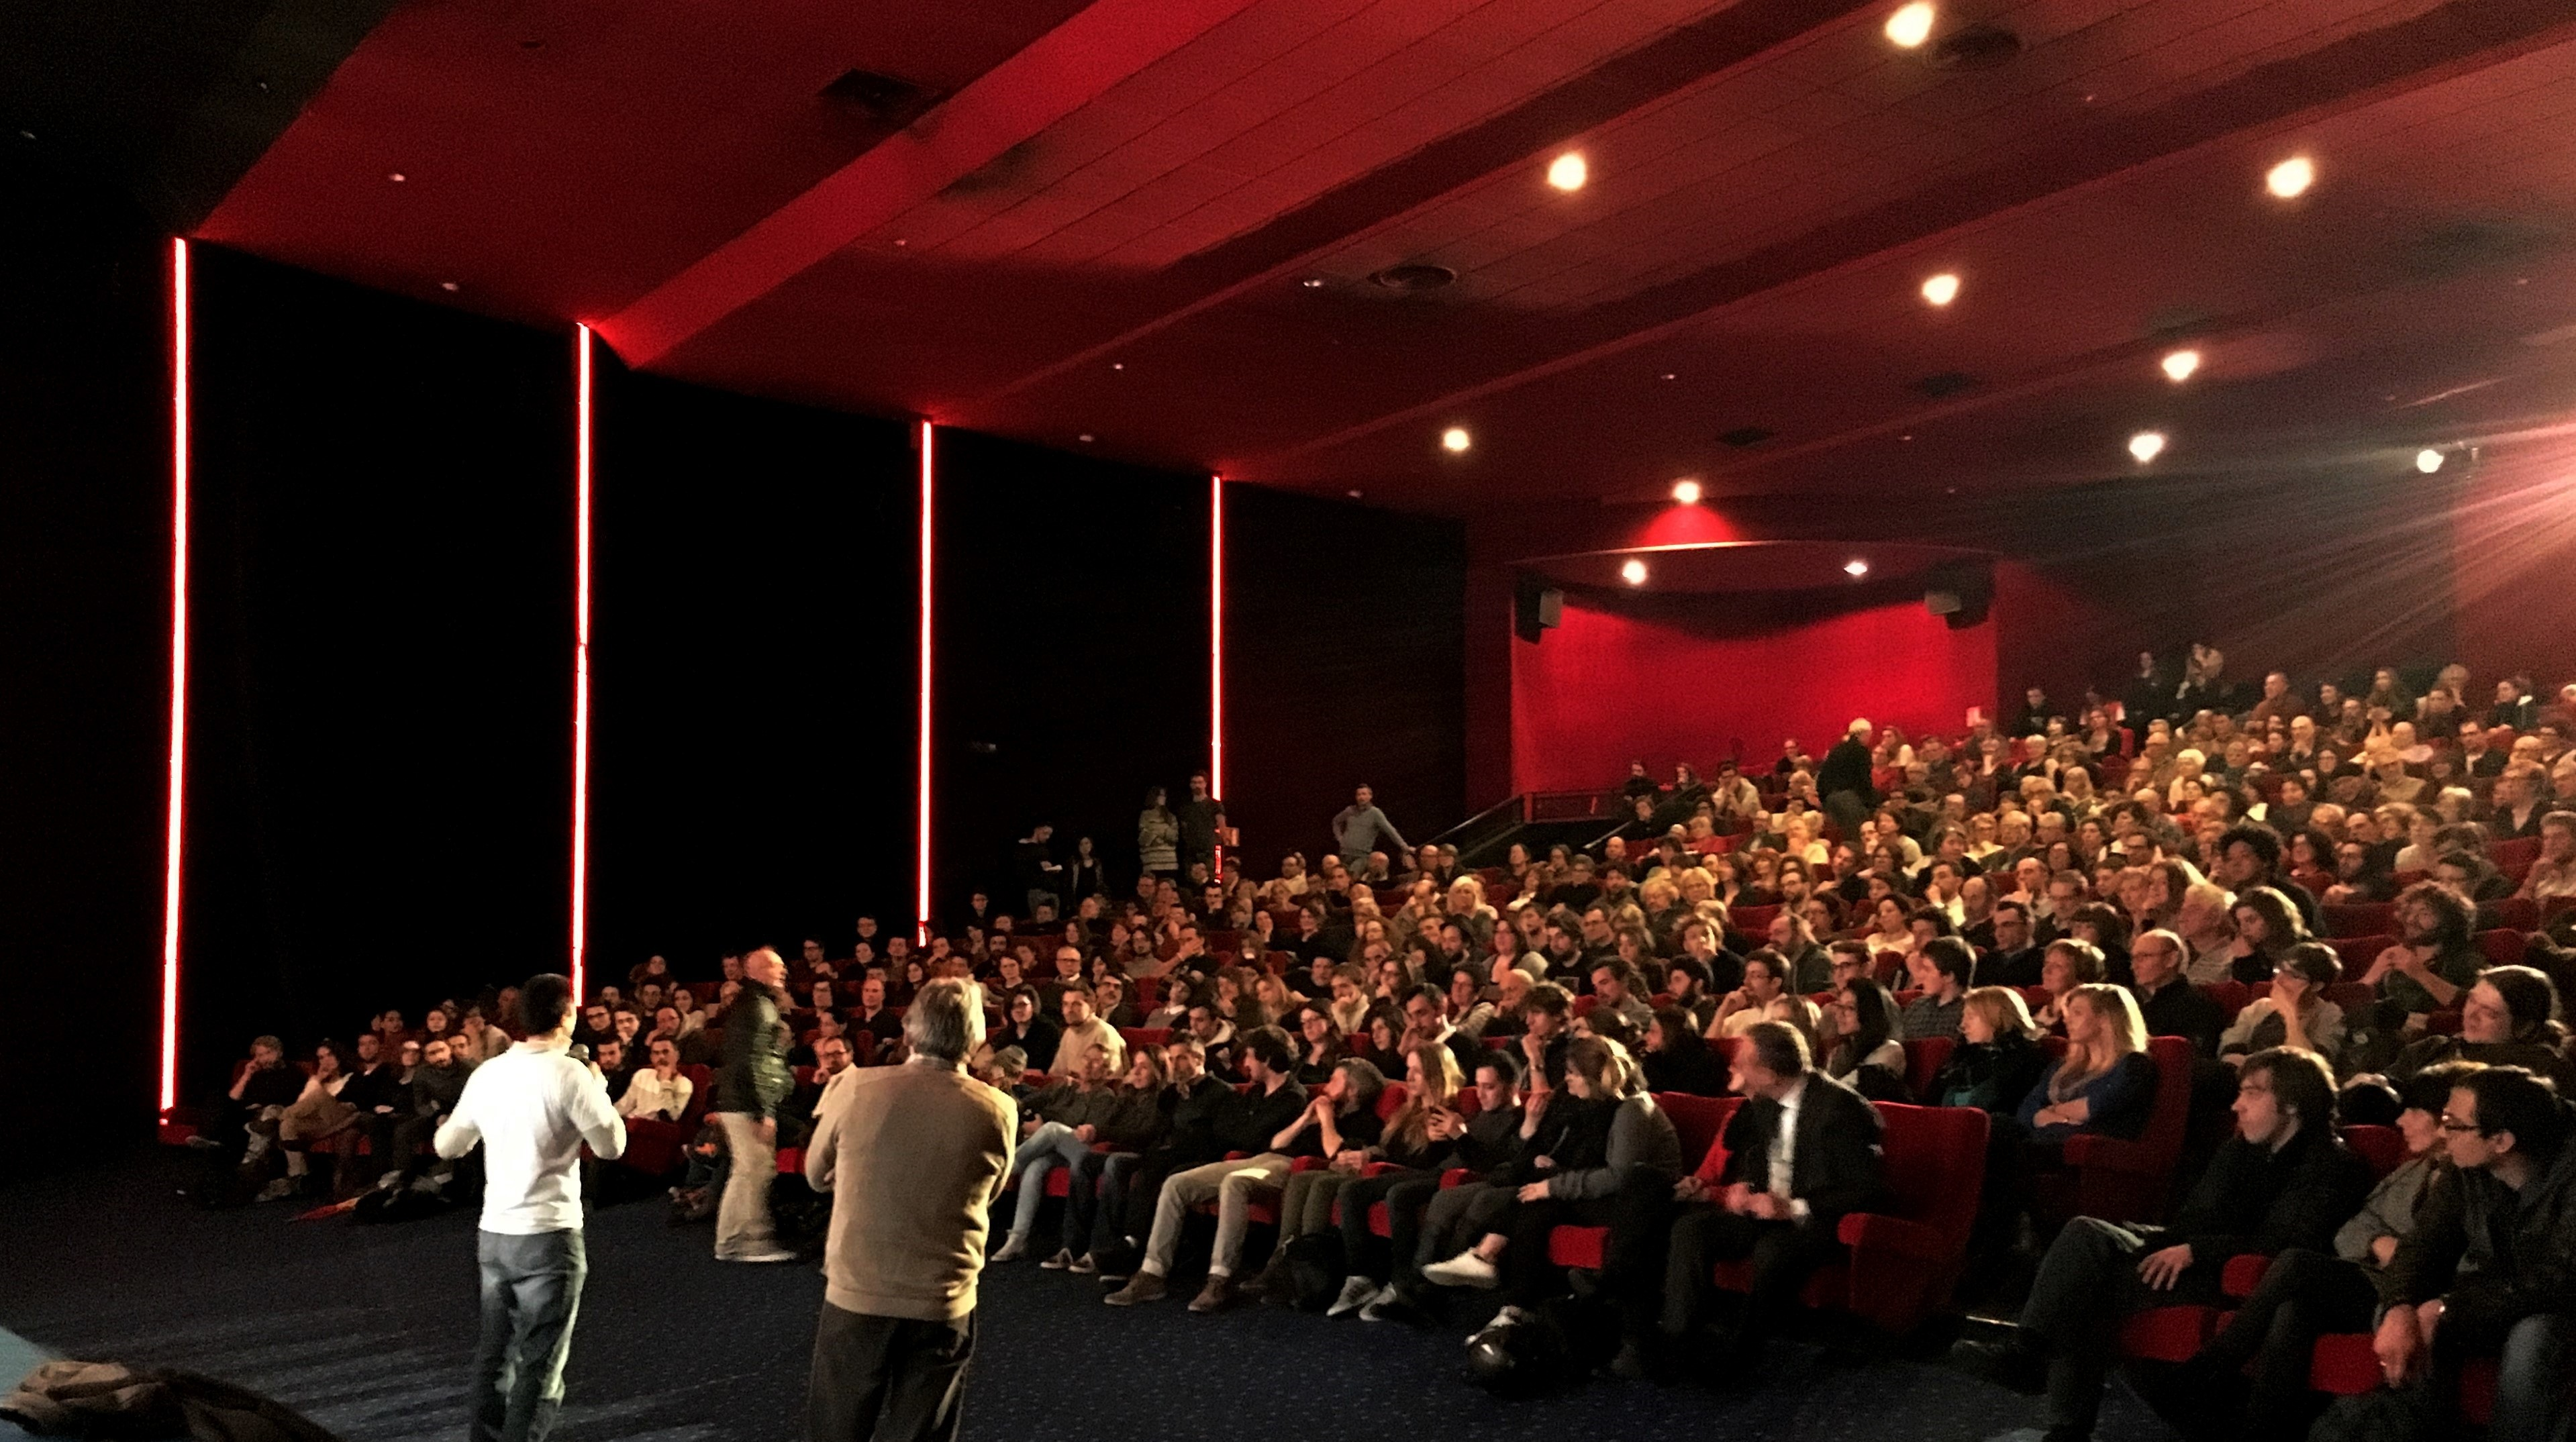 Europa Cinemas - Omnia, Rouen